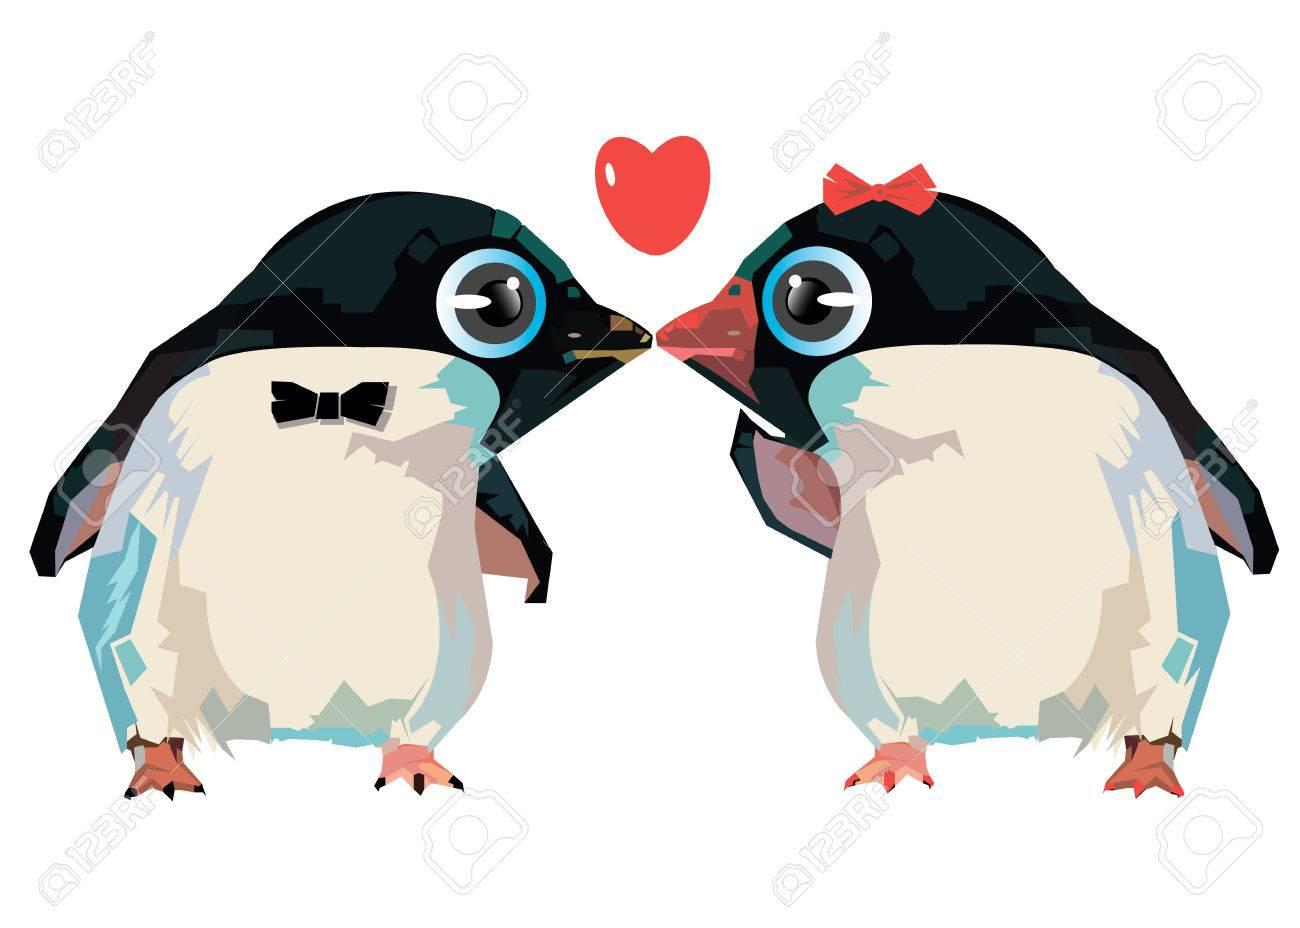 Pingüino Ilustración Dibujos Animados Animal Diseño Amor